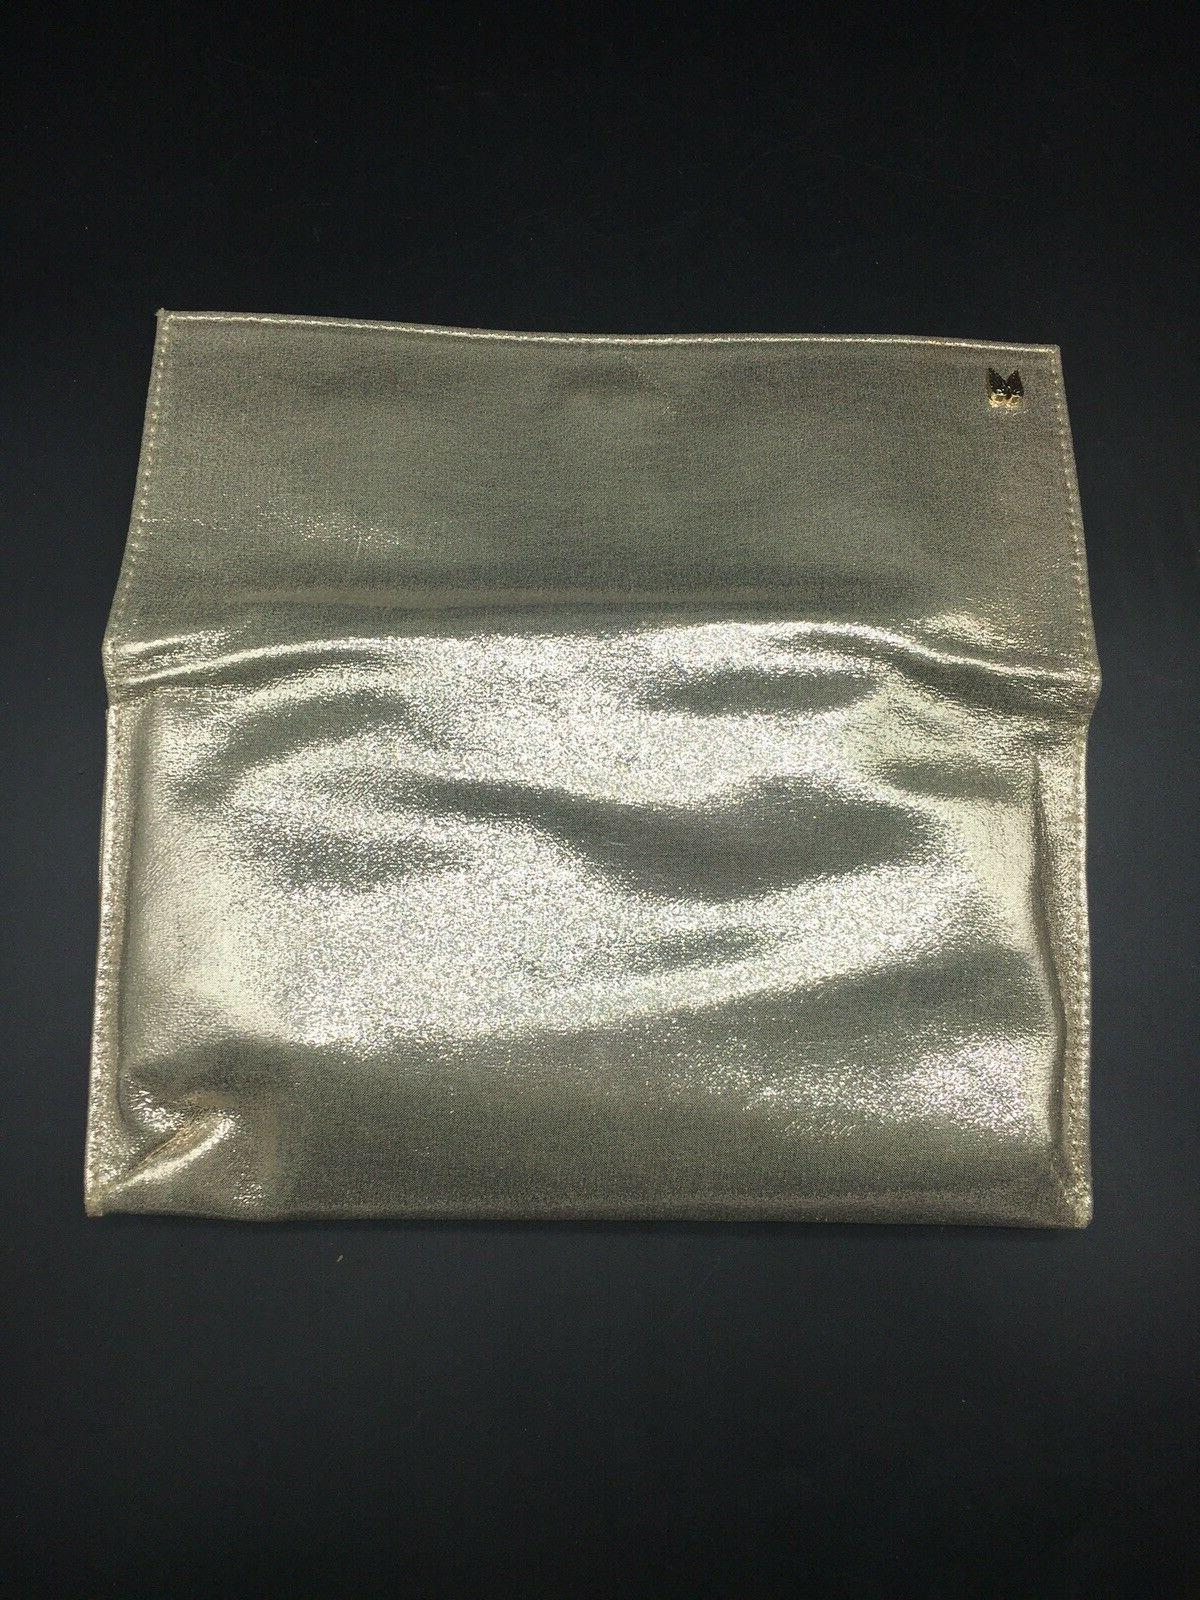 Victoria's Secret Travel Professional Flat Iron Straightener Gold